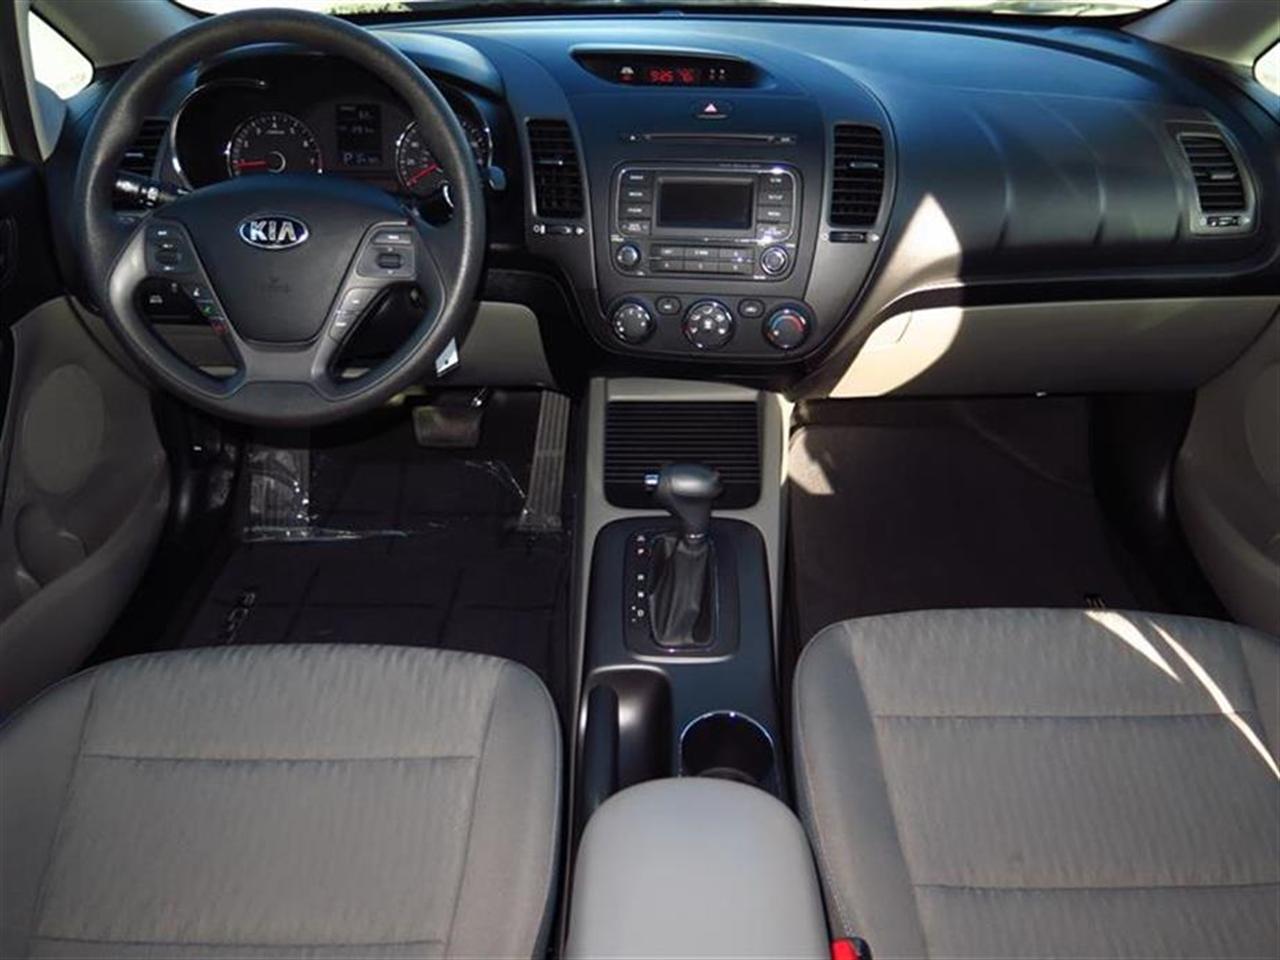 2014 KIA FORTE 4dr Sdn Auto LX 24190 miles 2 12V DC Power Outlets 4-Way Passenger Seat -inc Ma